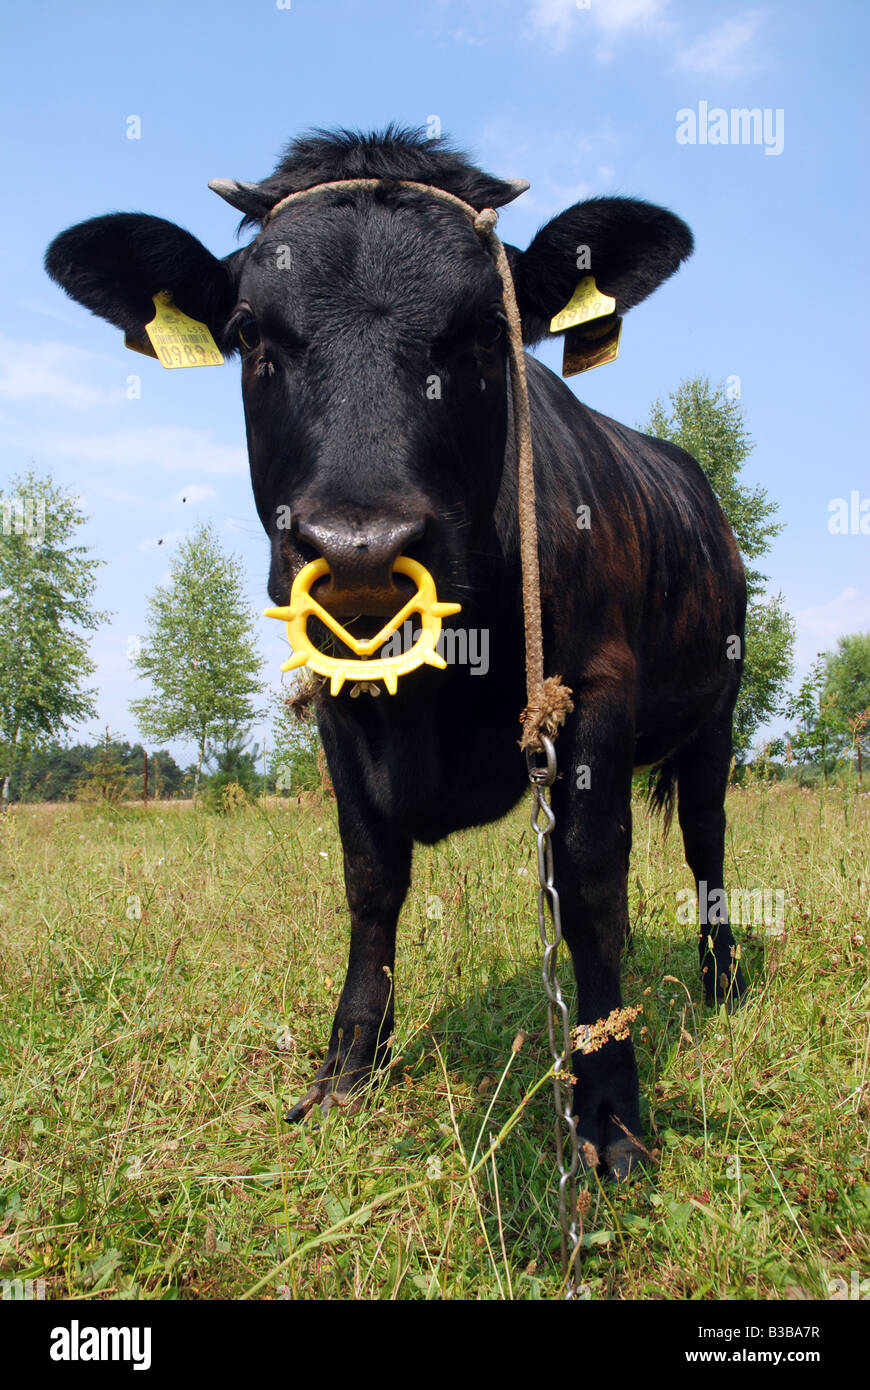 Black cow on pastureland in Poland (Masovia region) - Stock Image